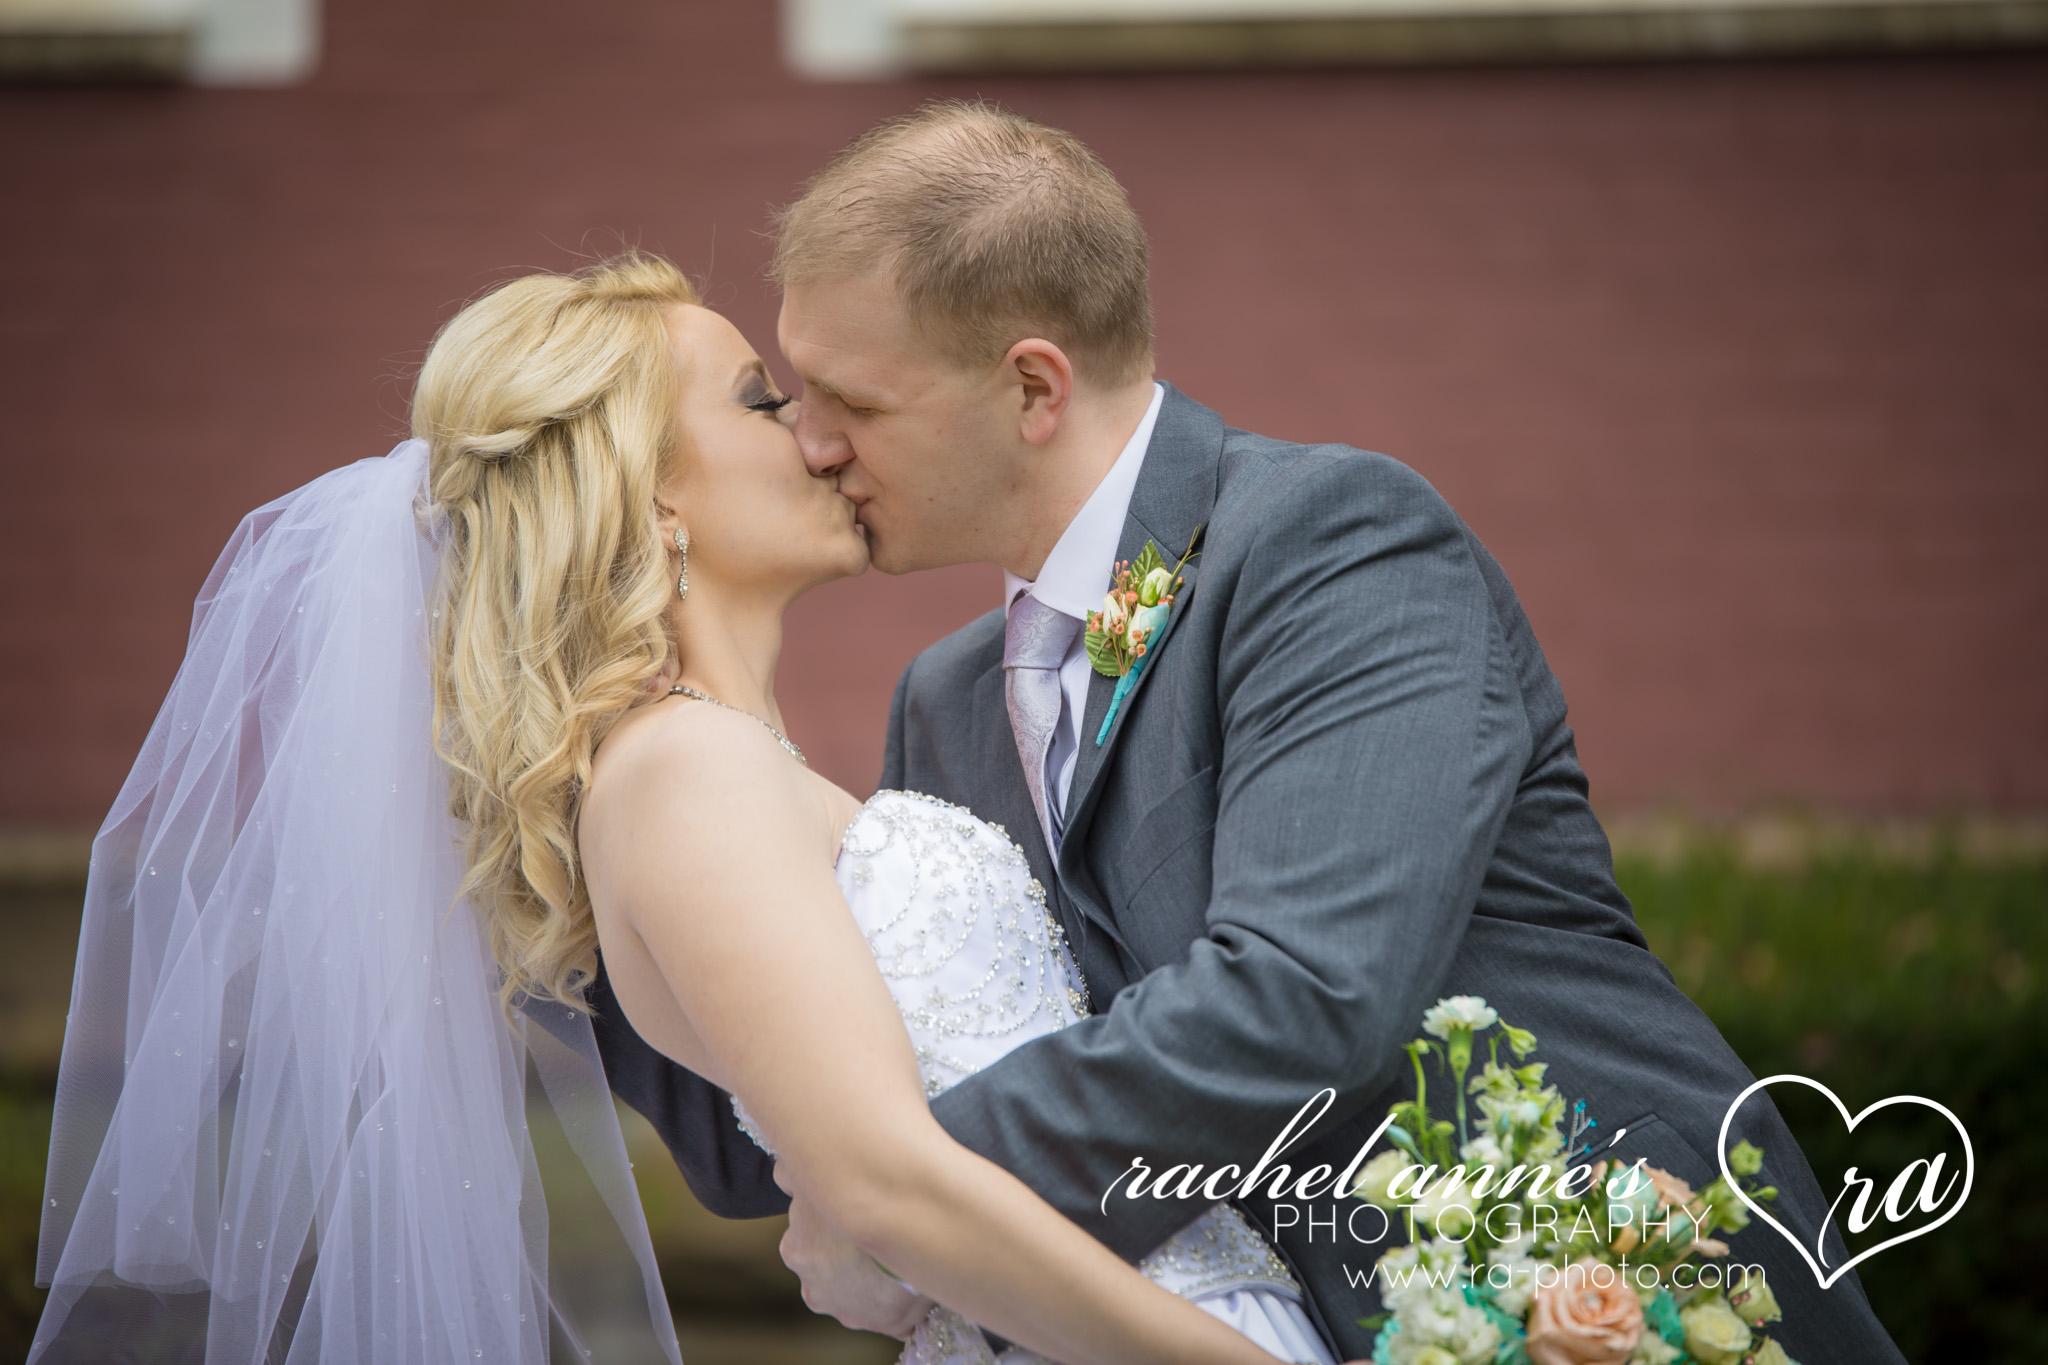 034-JKS-WEDDINGS-THE-FRANKLIN-PA.jpg